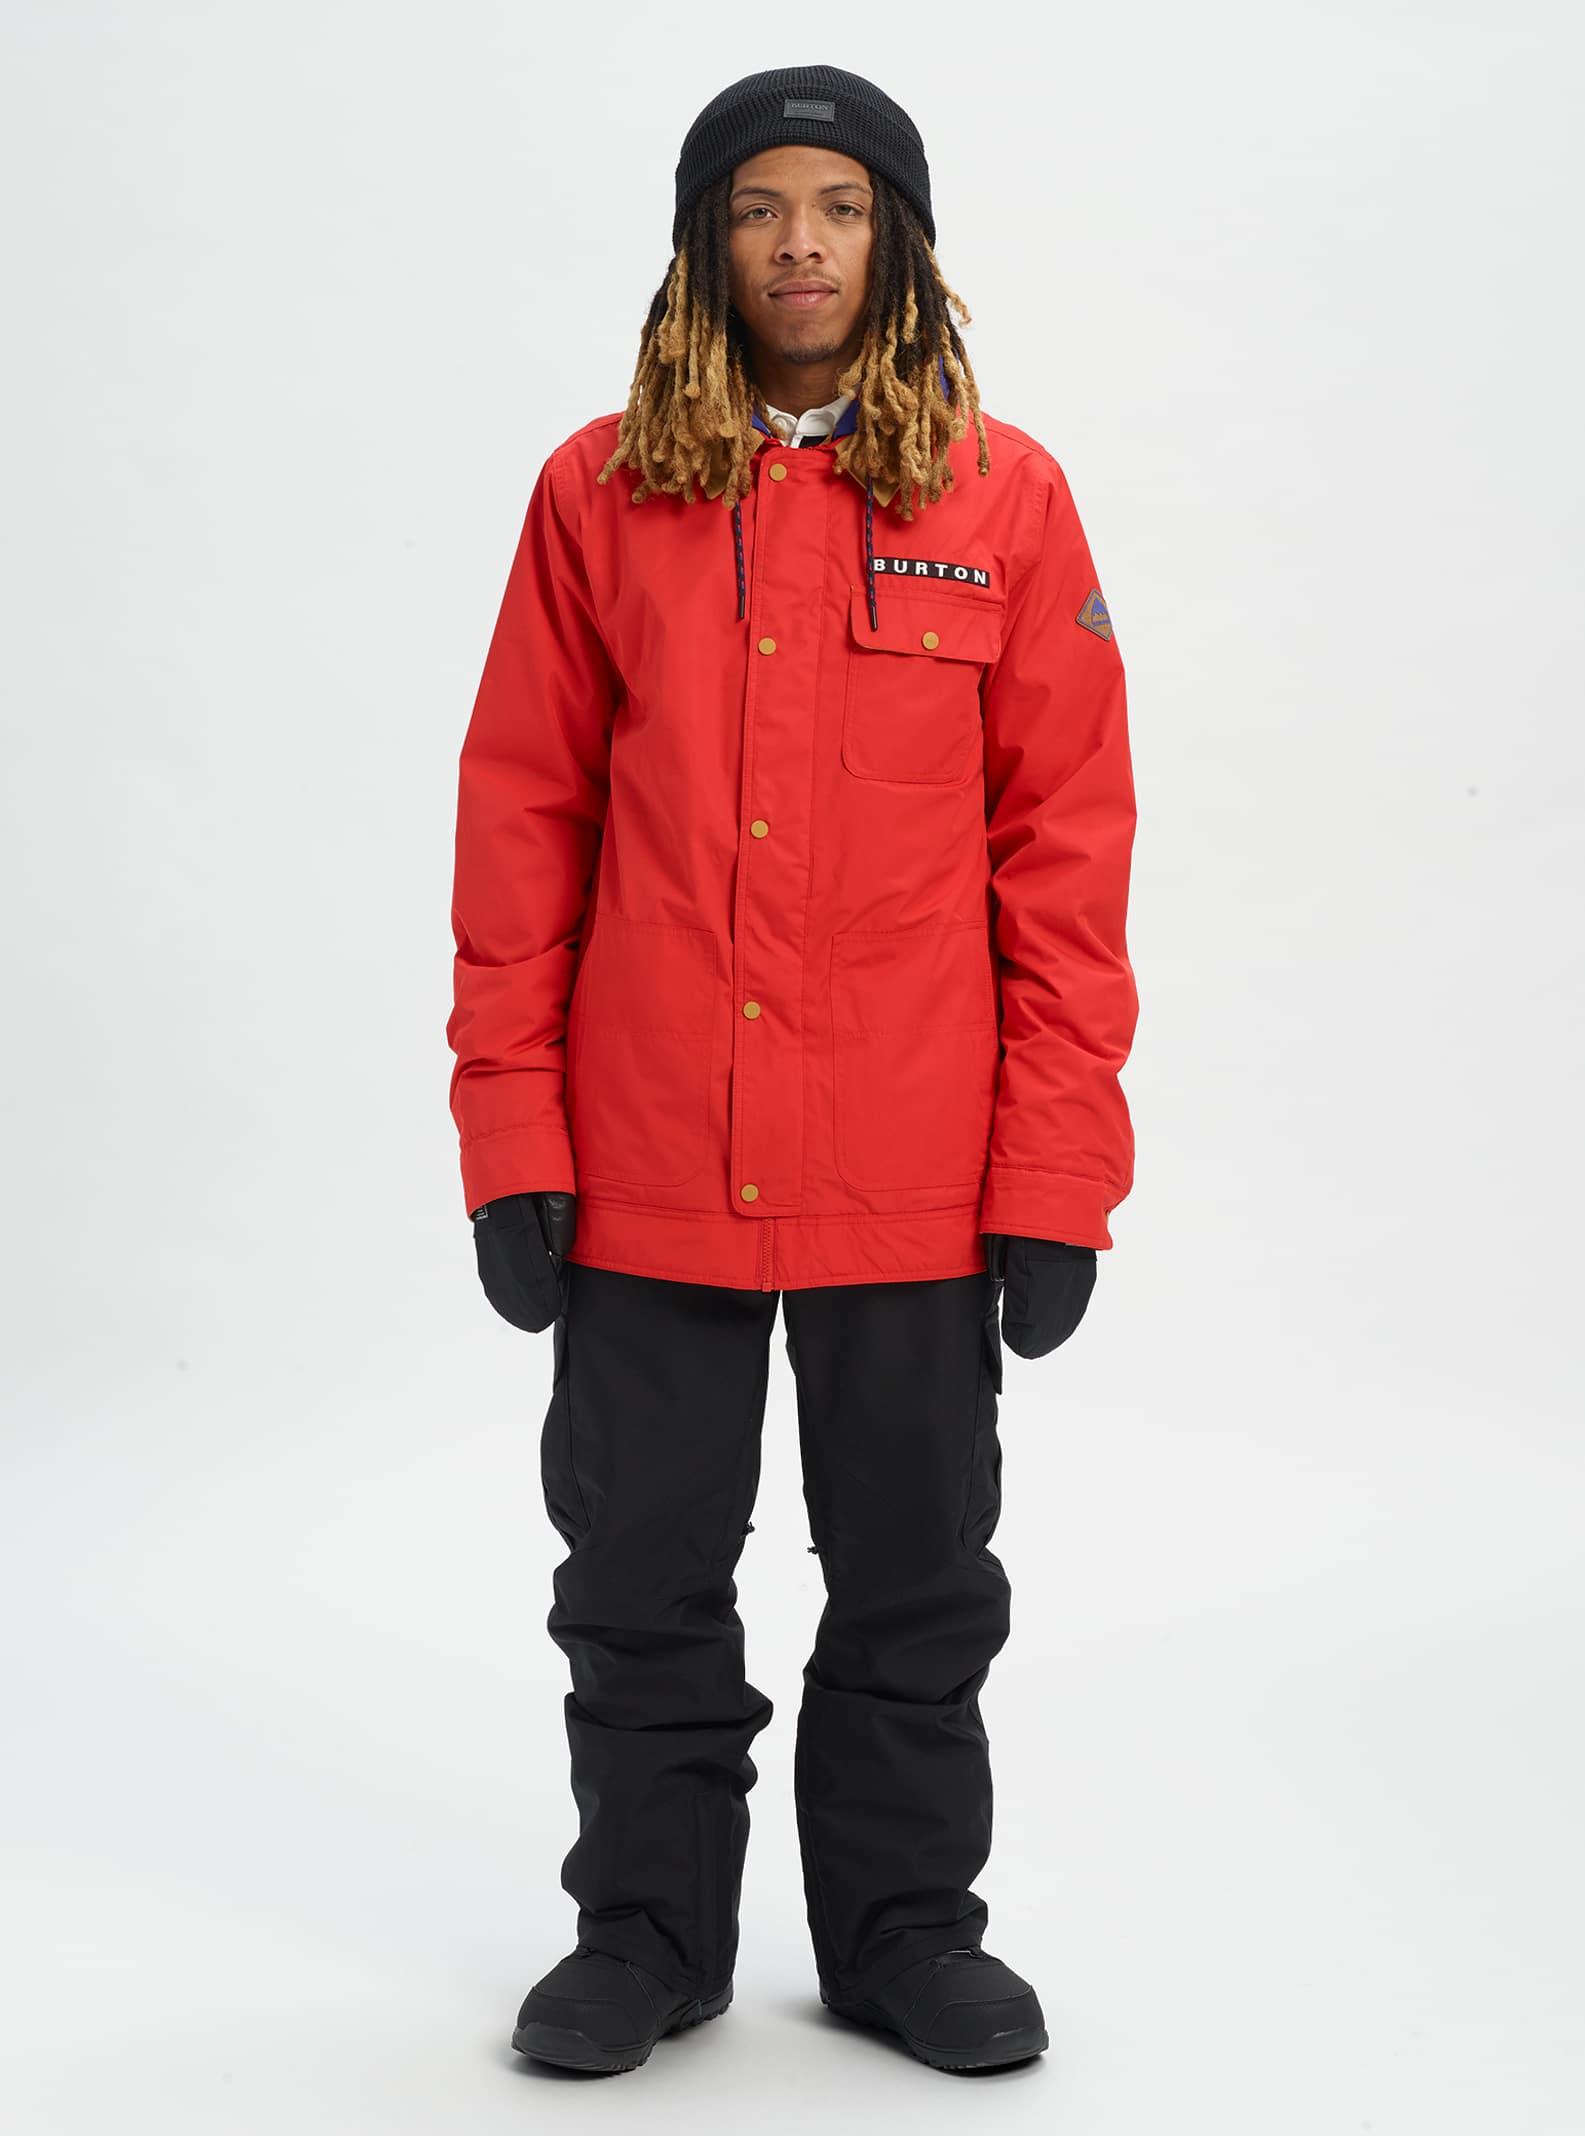 9a668f8e2 Men's Snowboard Jackets | Burton Snowboards